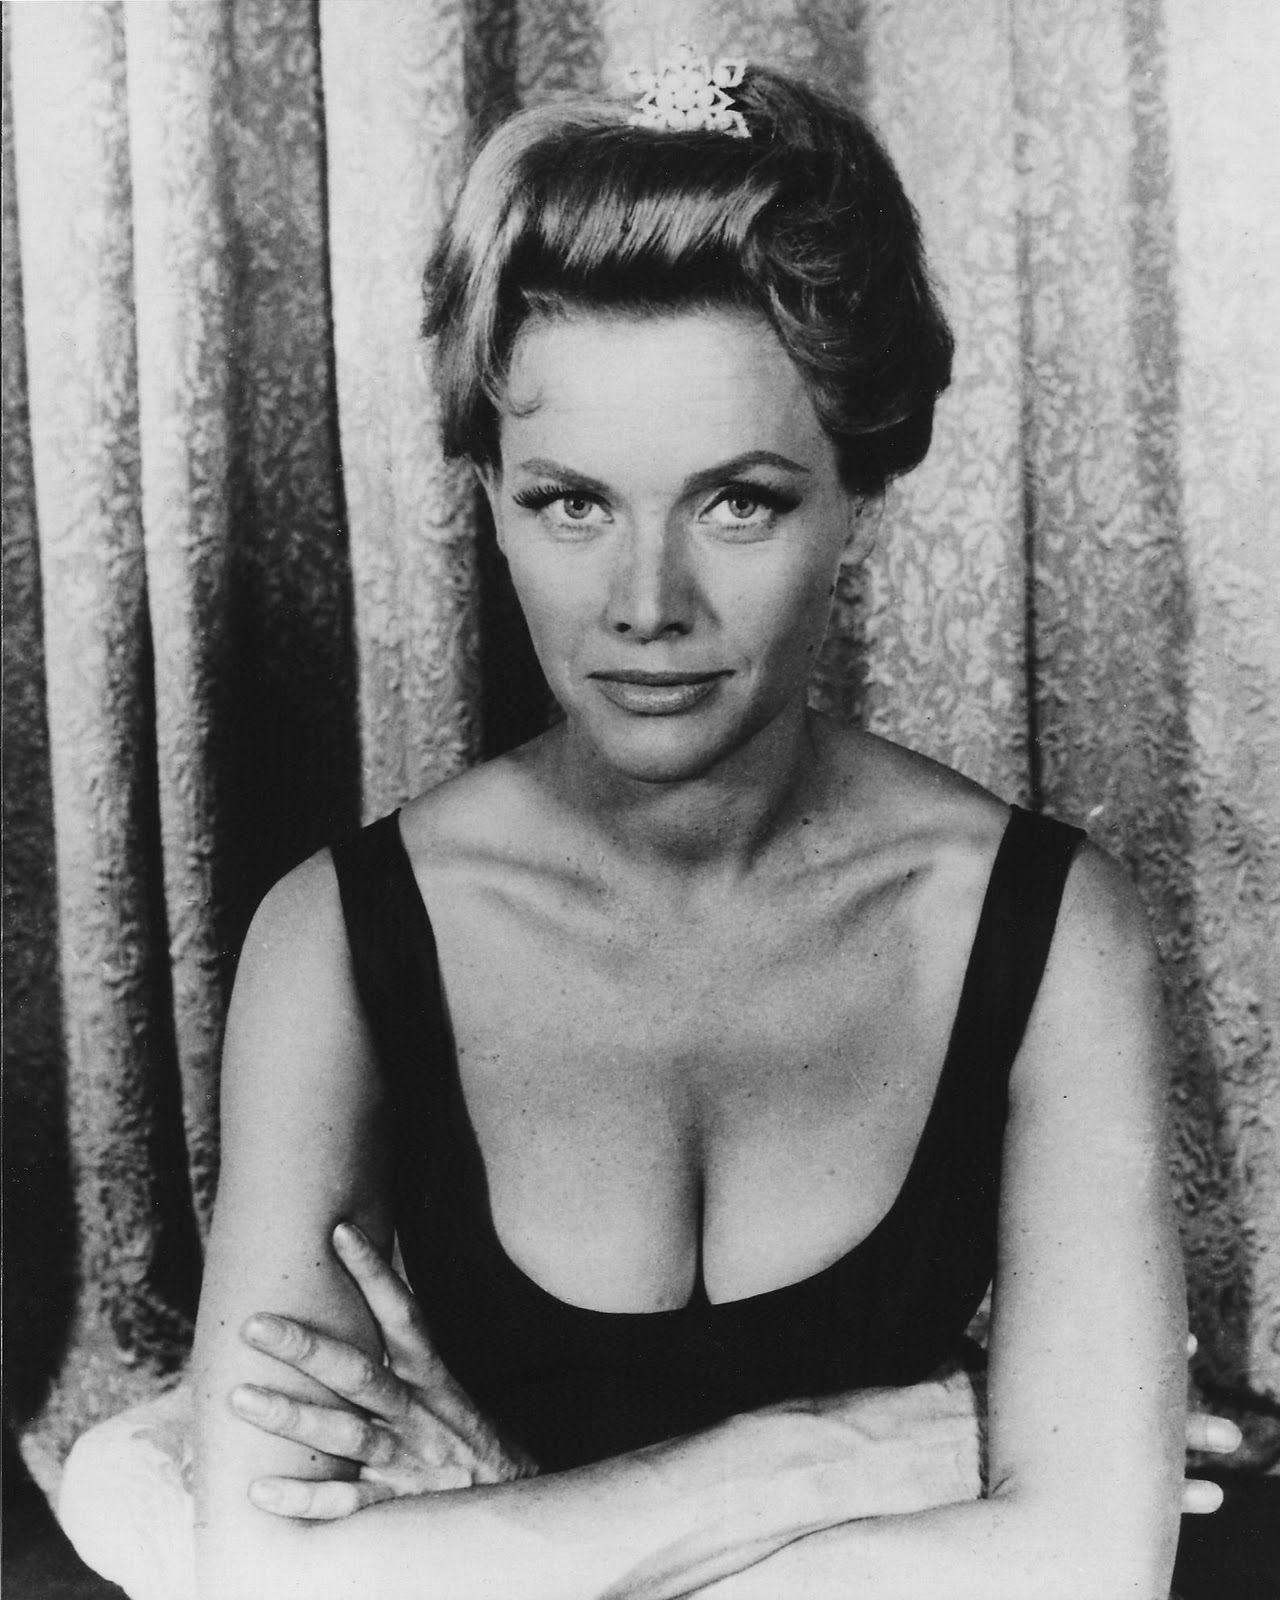 Emily Perkins,Rio Diaz (1959?004) Erotic pics & movies Lauren Storm,Margaret Court 24 Grand Slam singles titles (11 in open-era)